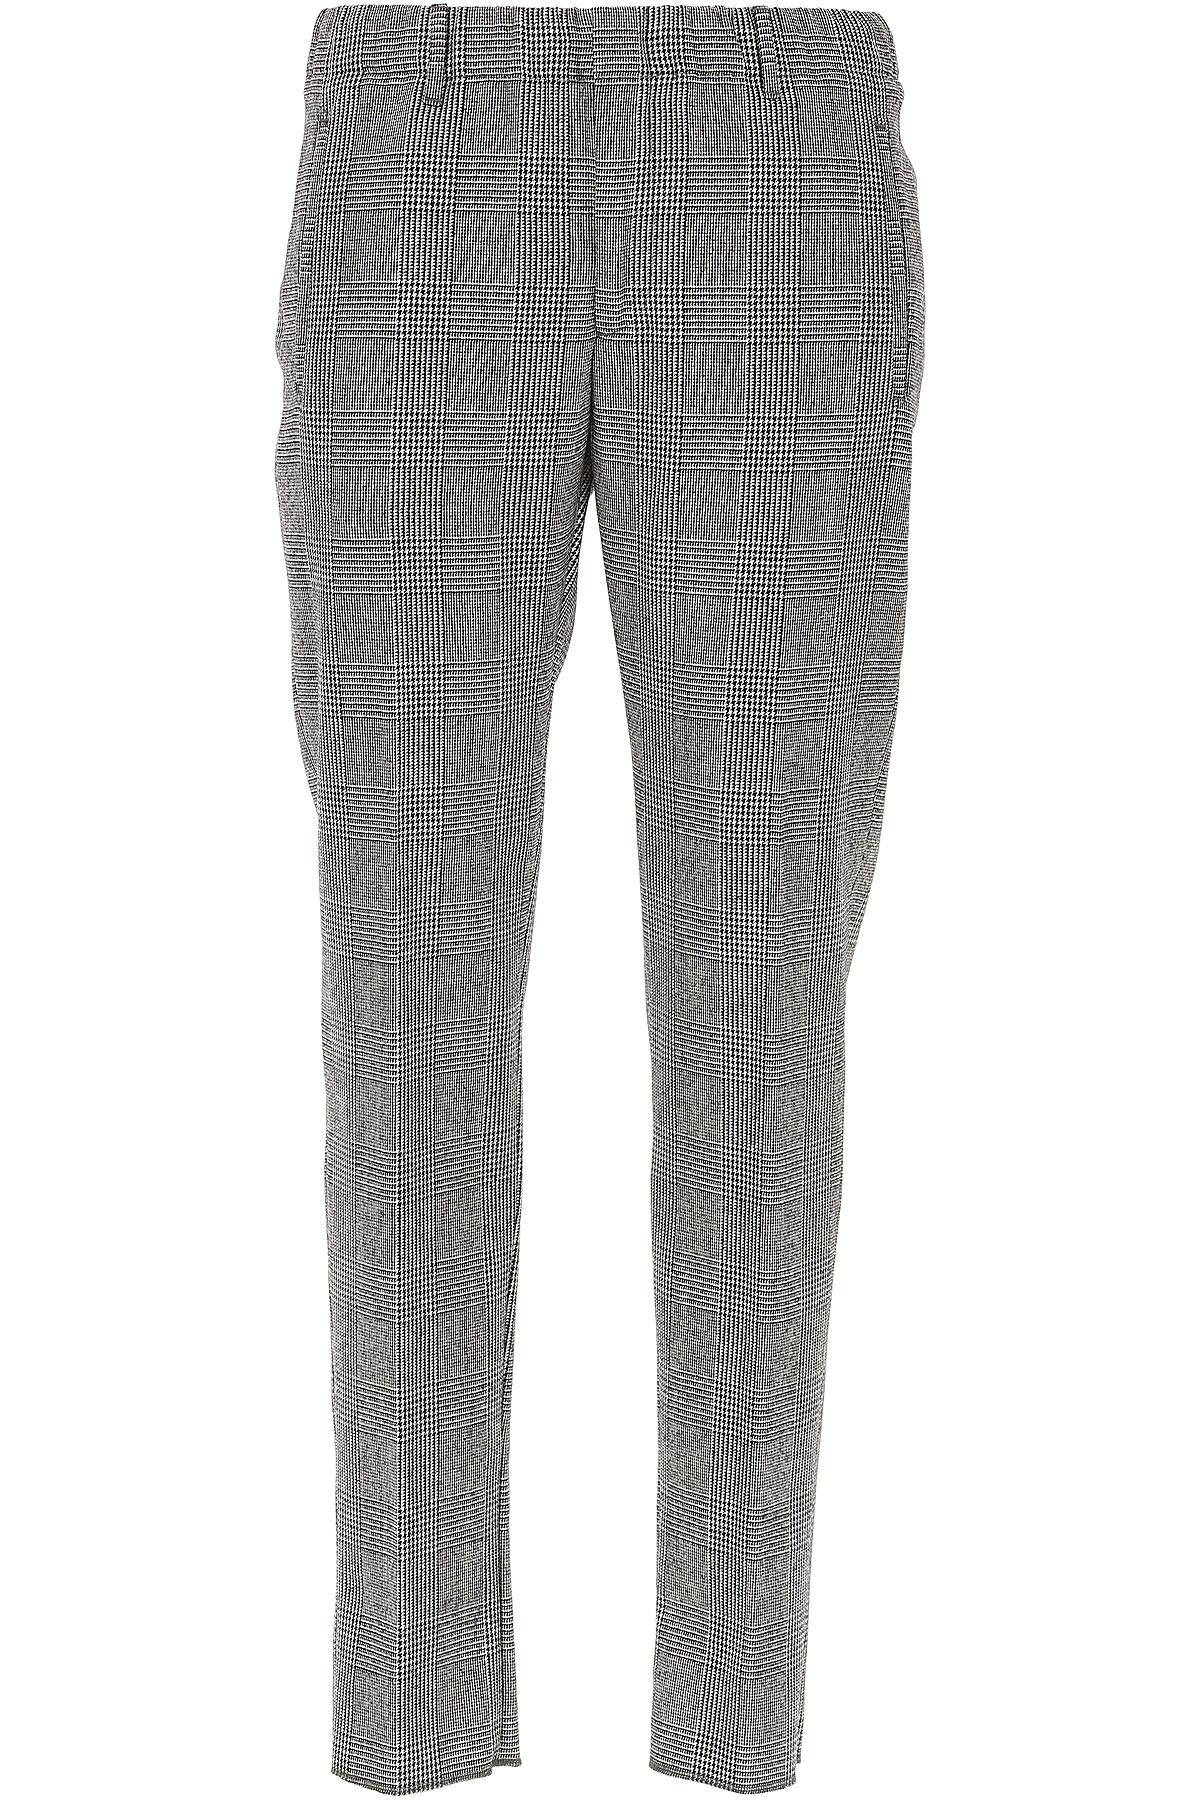 Image of Incotex Pants for Men, Black, Wool, 2017, 32 34